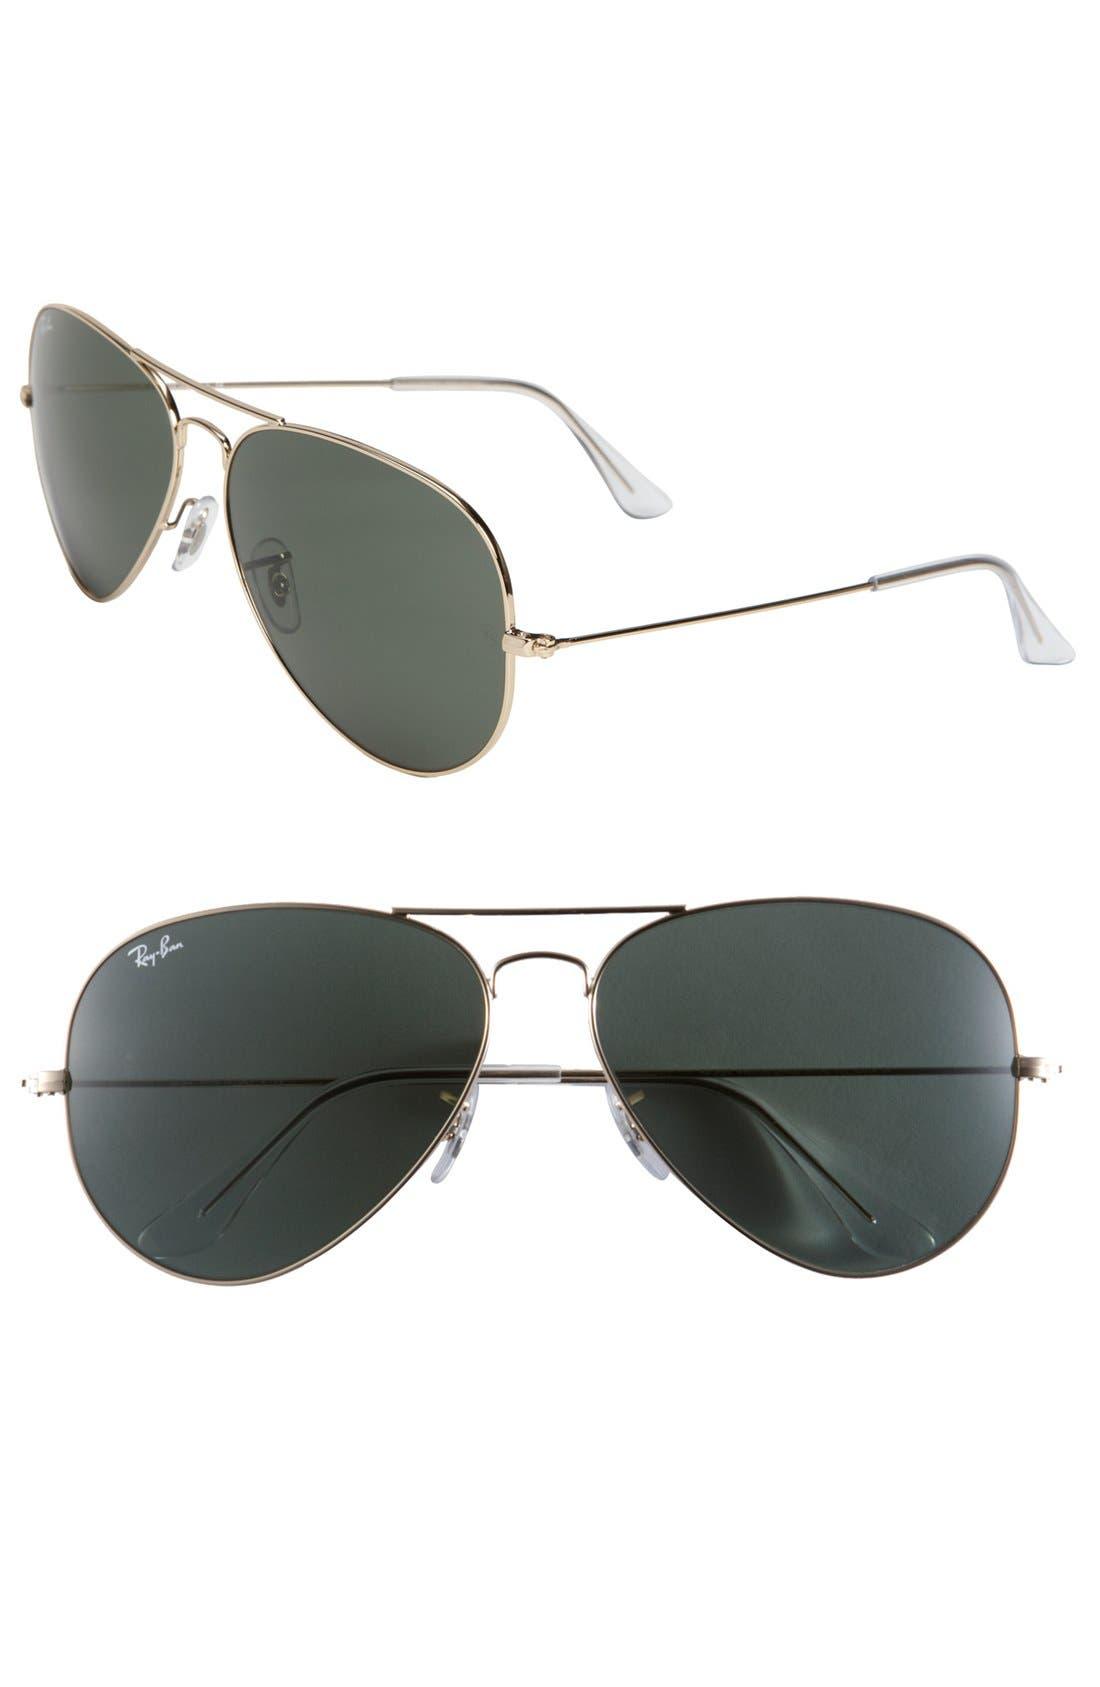 Large Original 62mm Aviator Sunglasses,                         Main,                         color, Gold/ Green